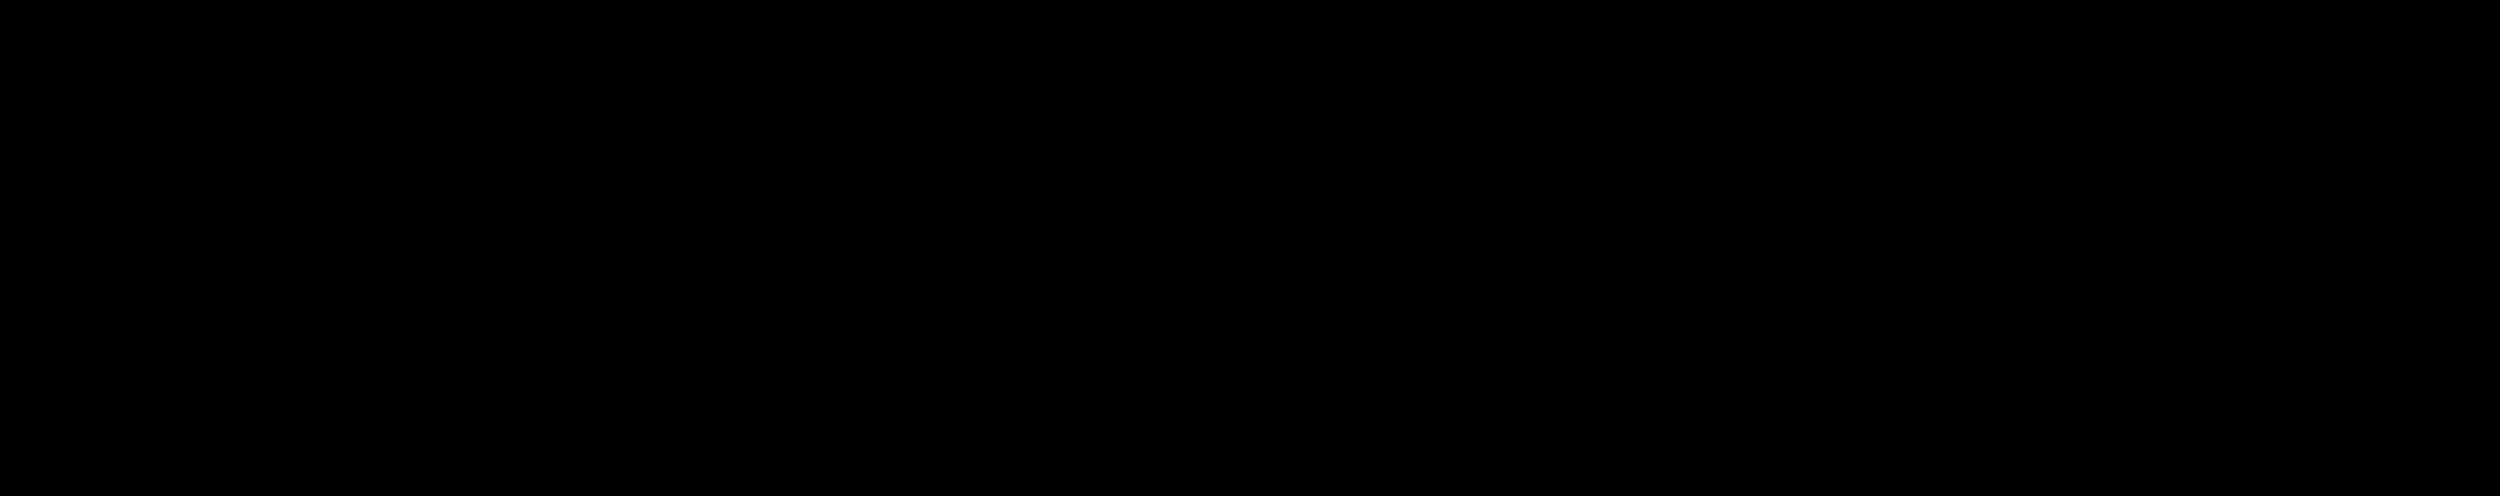 DeepTech logos_primary logo black.png